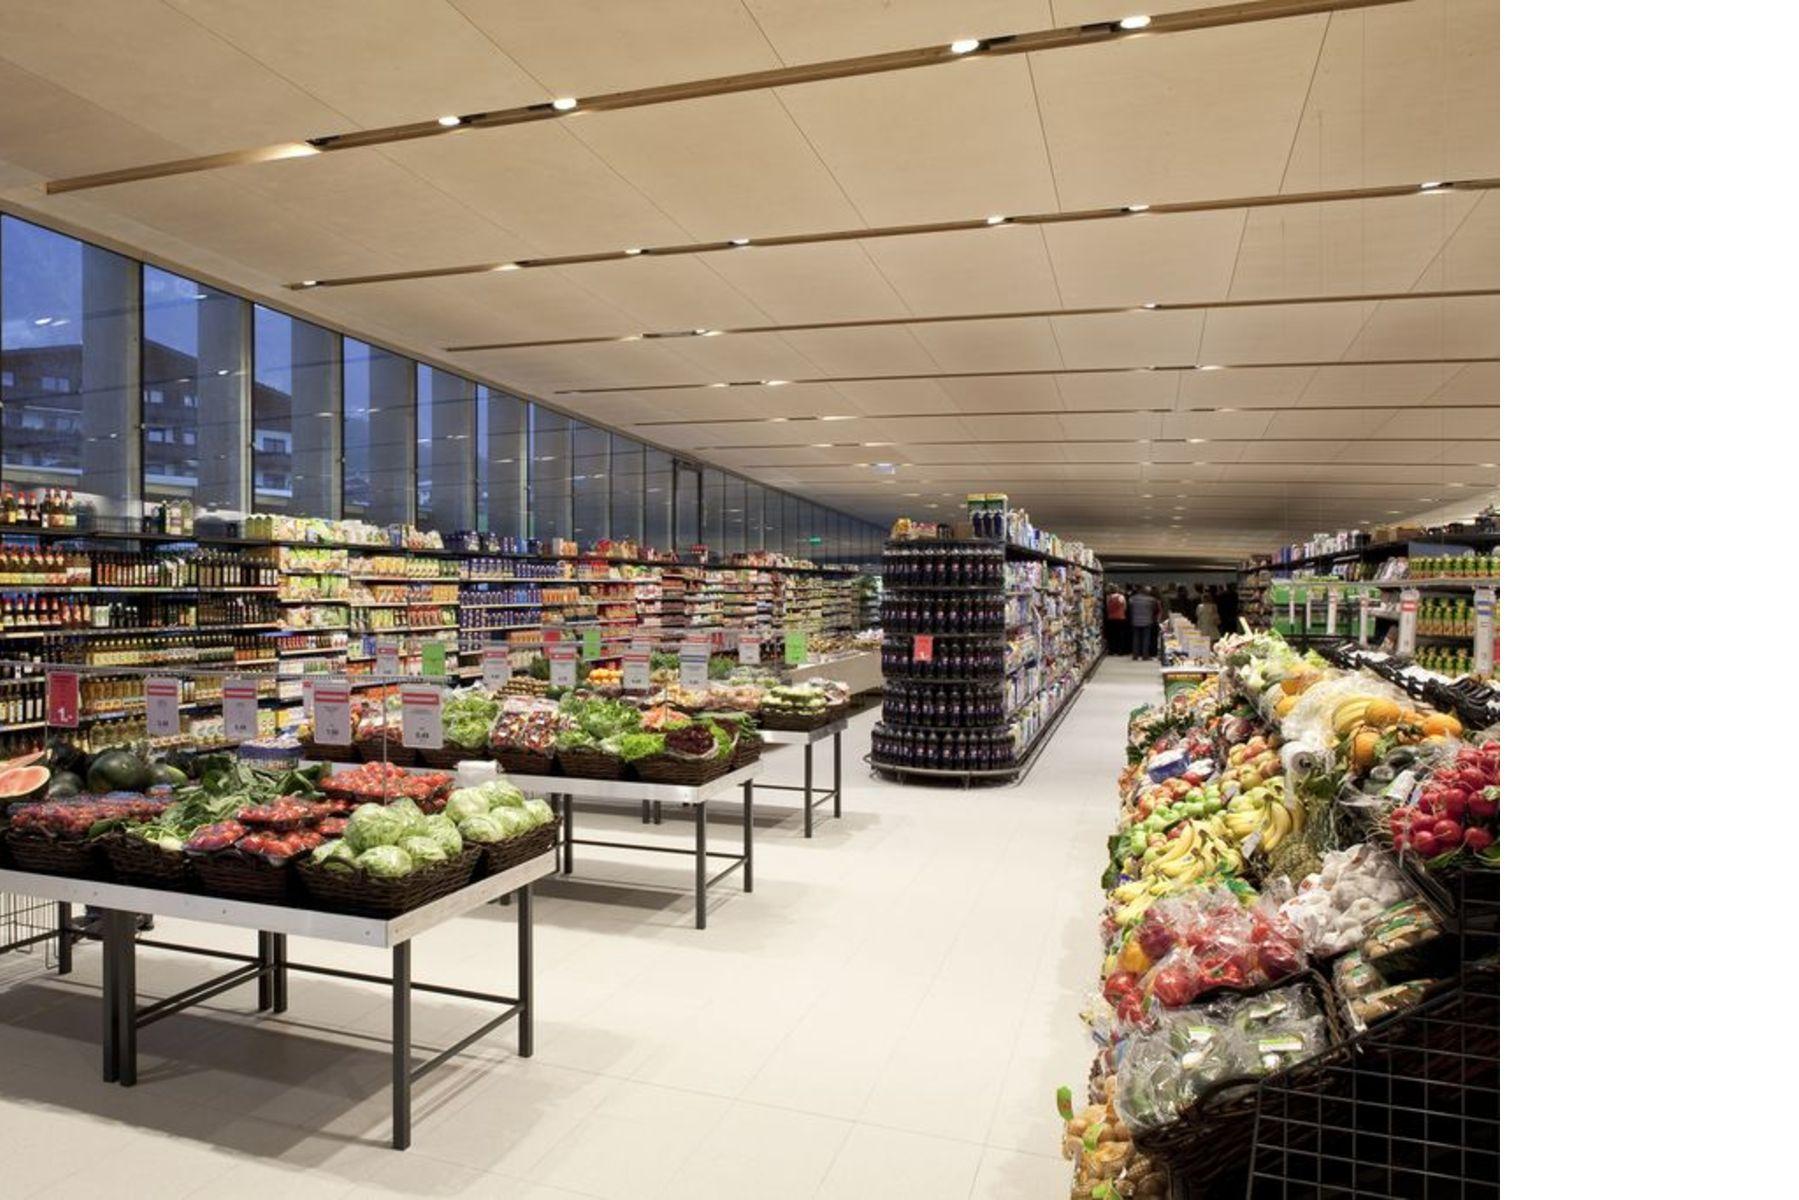 Fügenschuh: supermercado MPreis en Wiesing